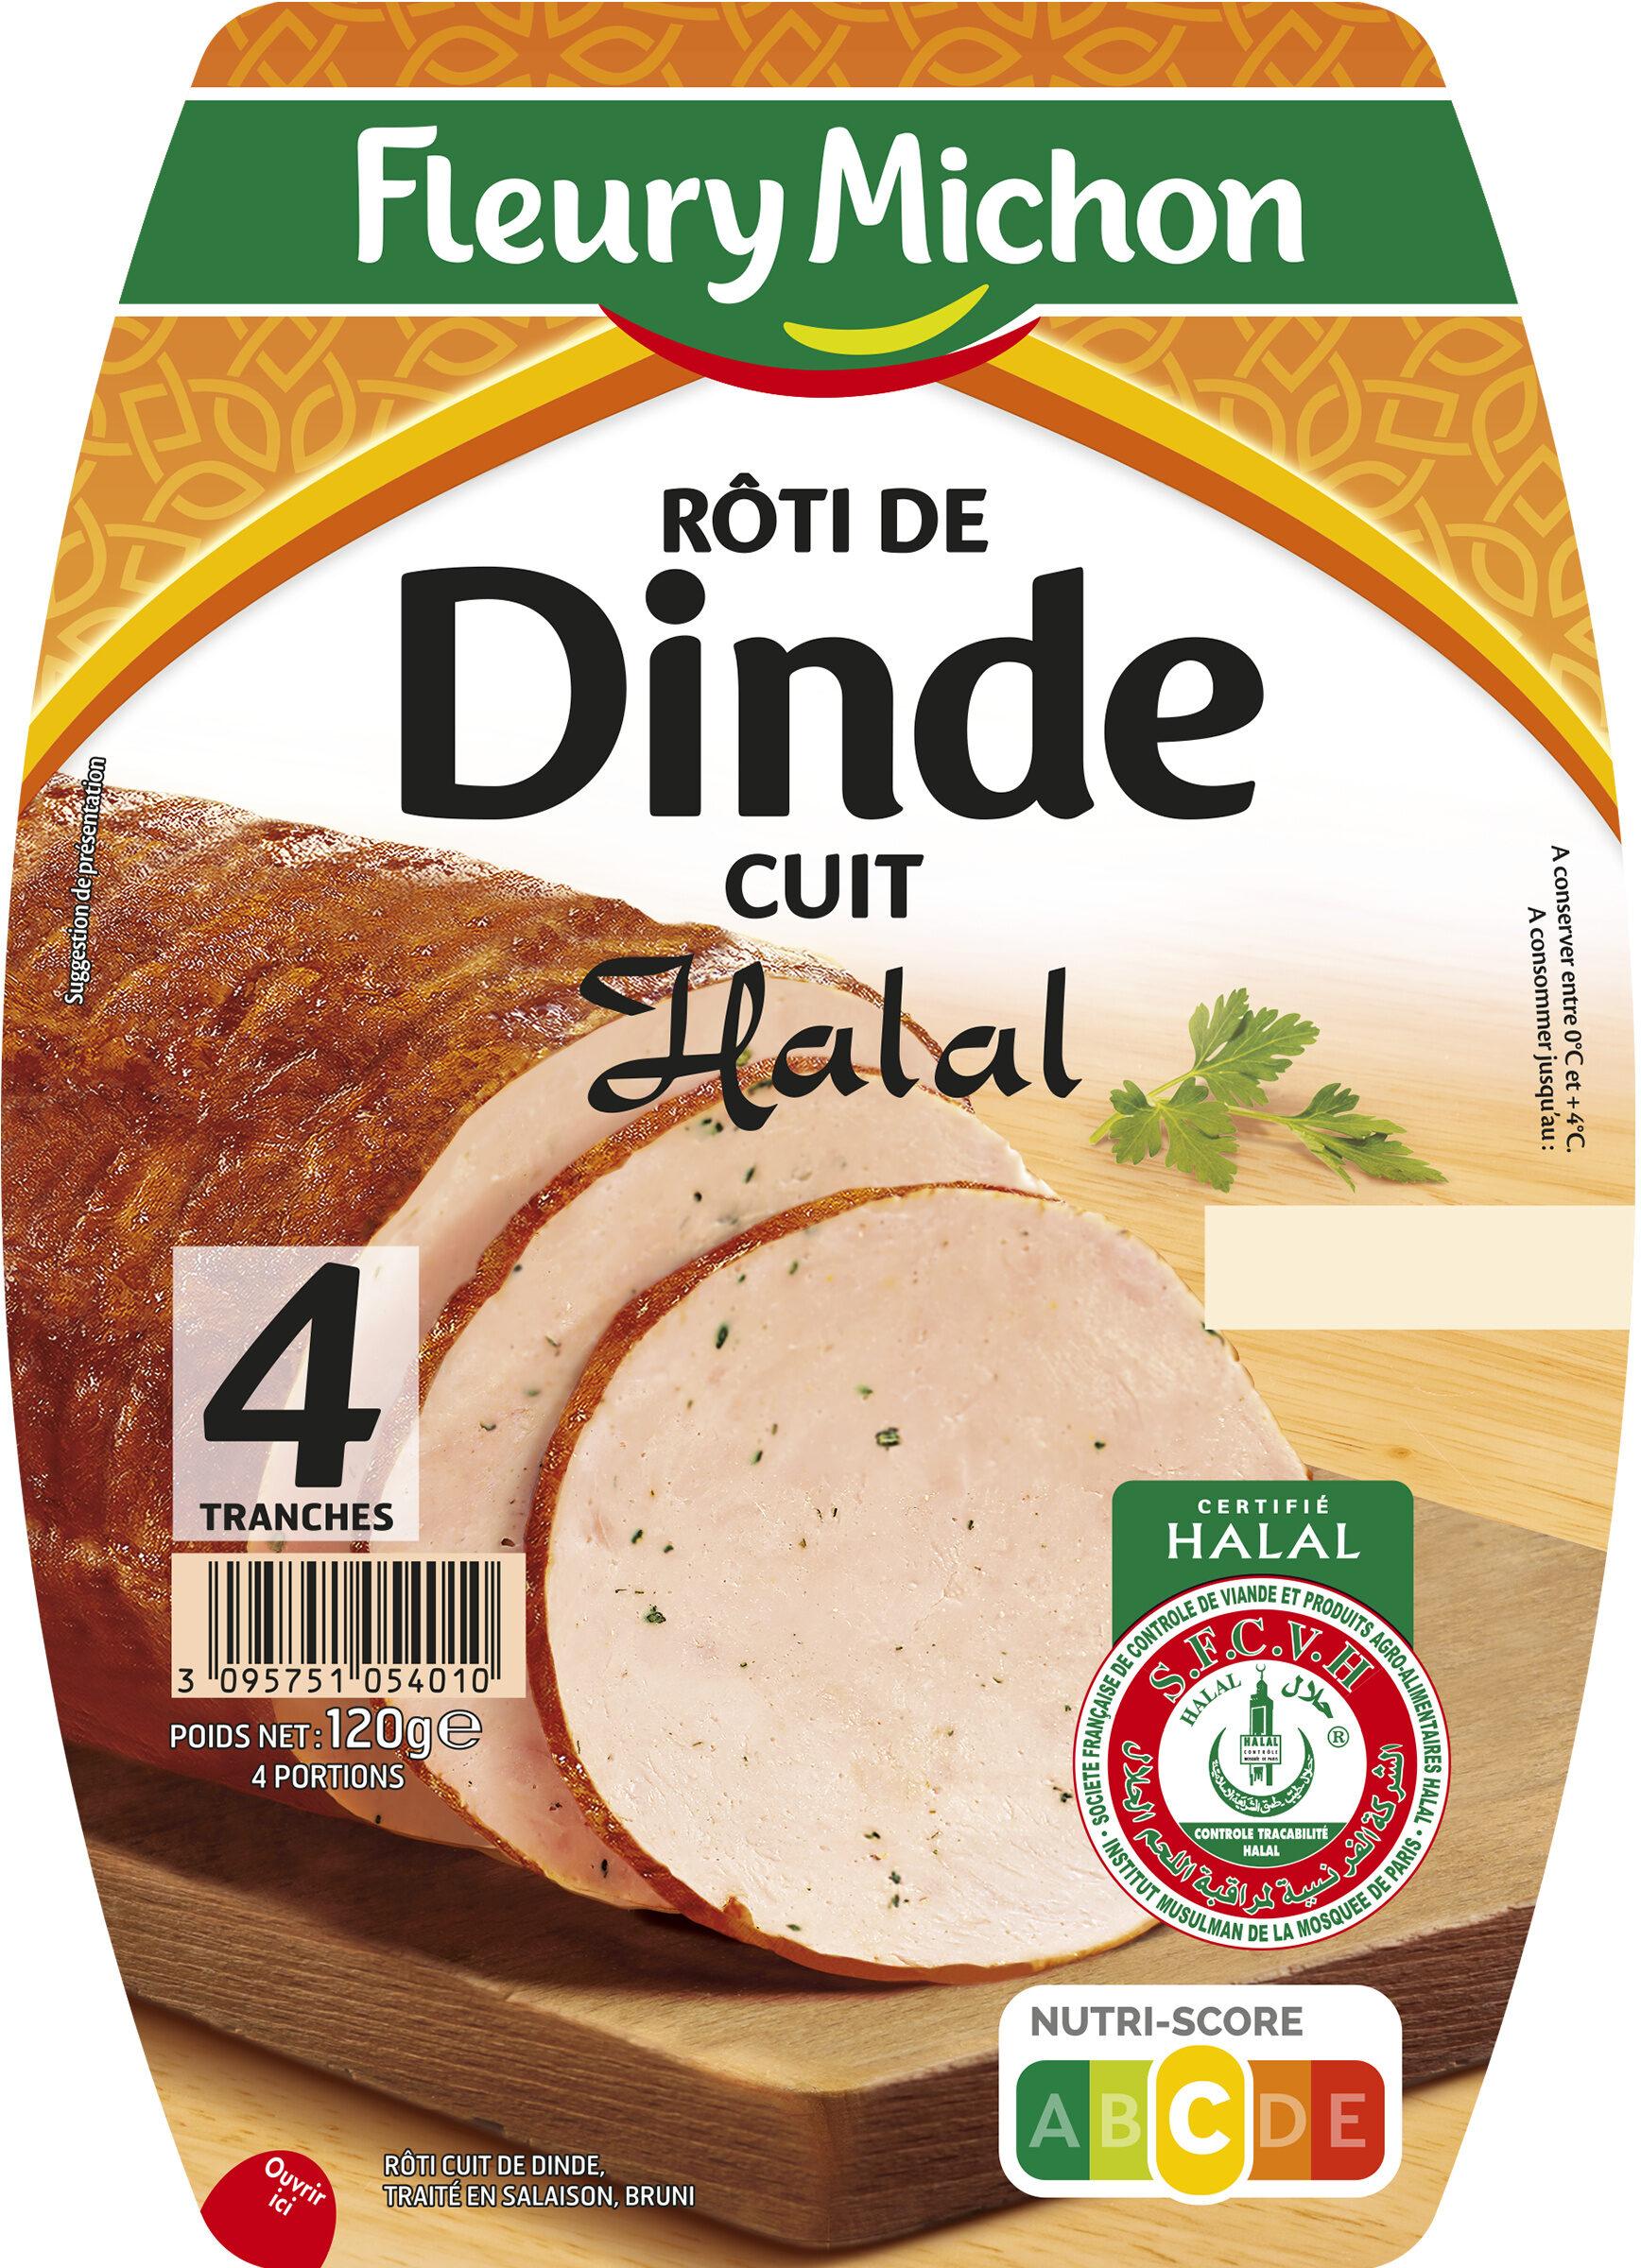 Rôti de dinde cuit Halal - 4tr - Produit - fr